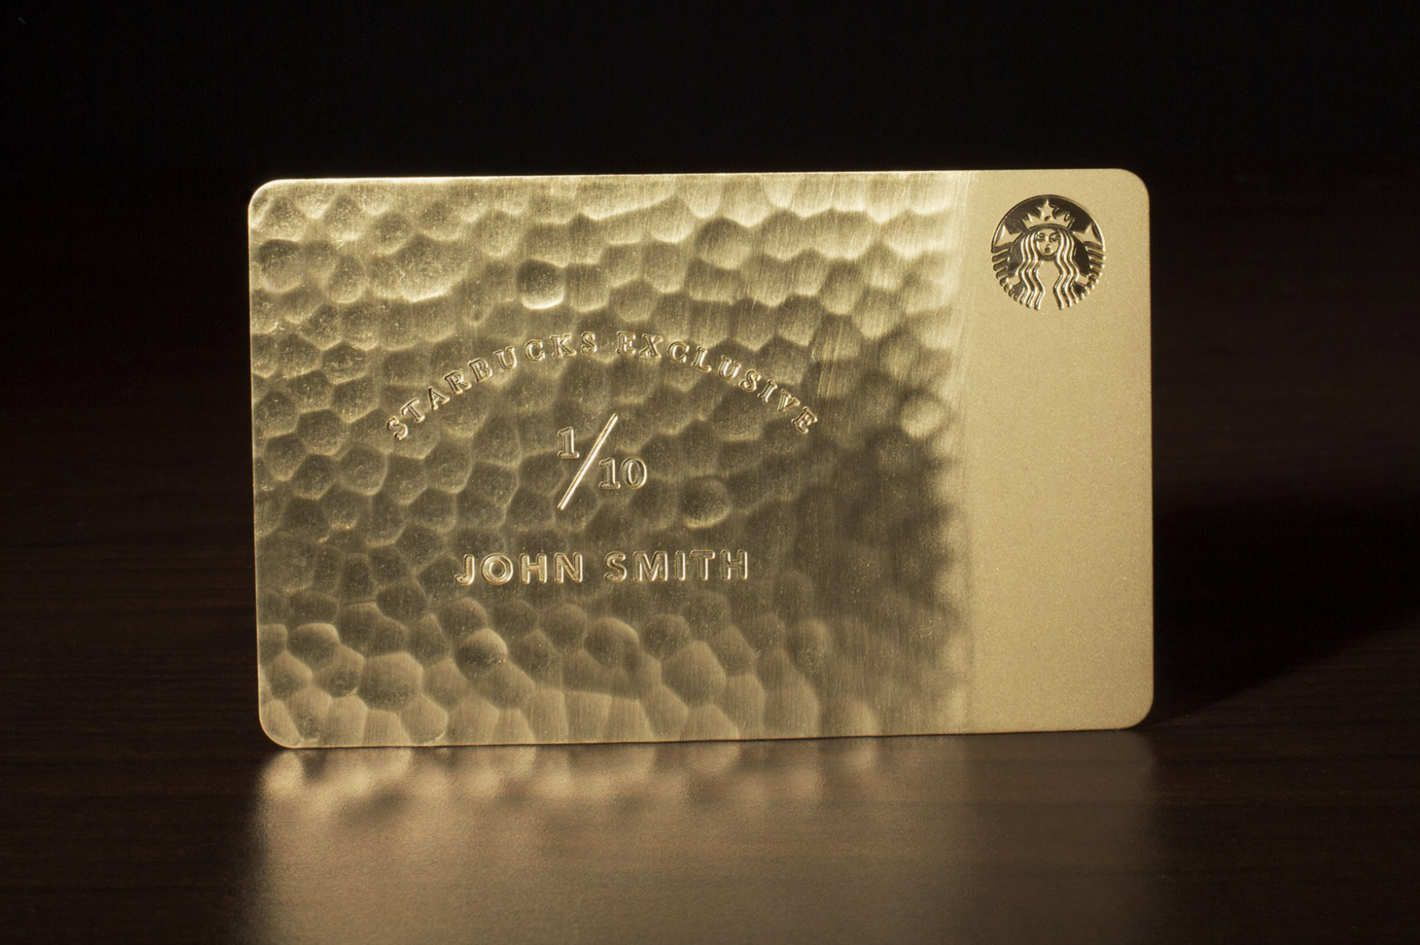 Starbucks Gold Card Credit Card Design Starbucks Gold Card Gold Credit Card